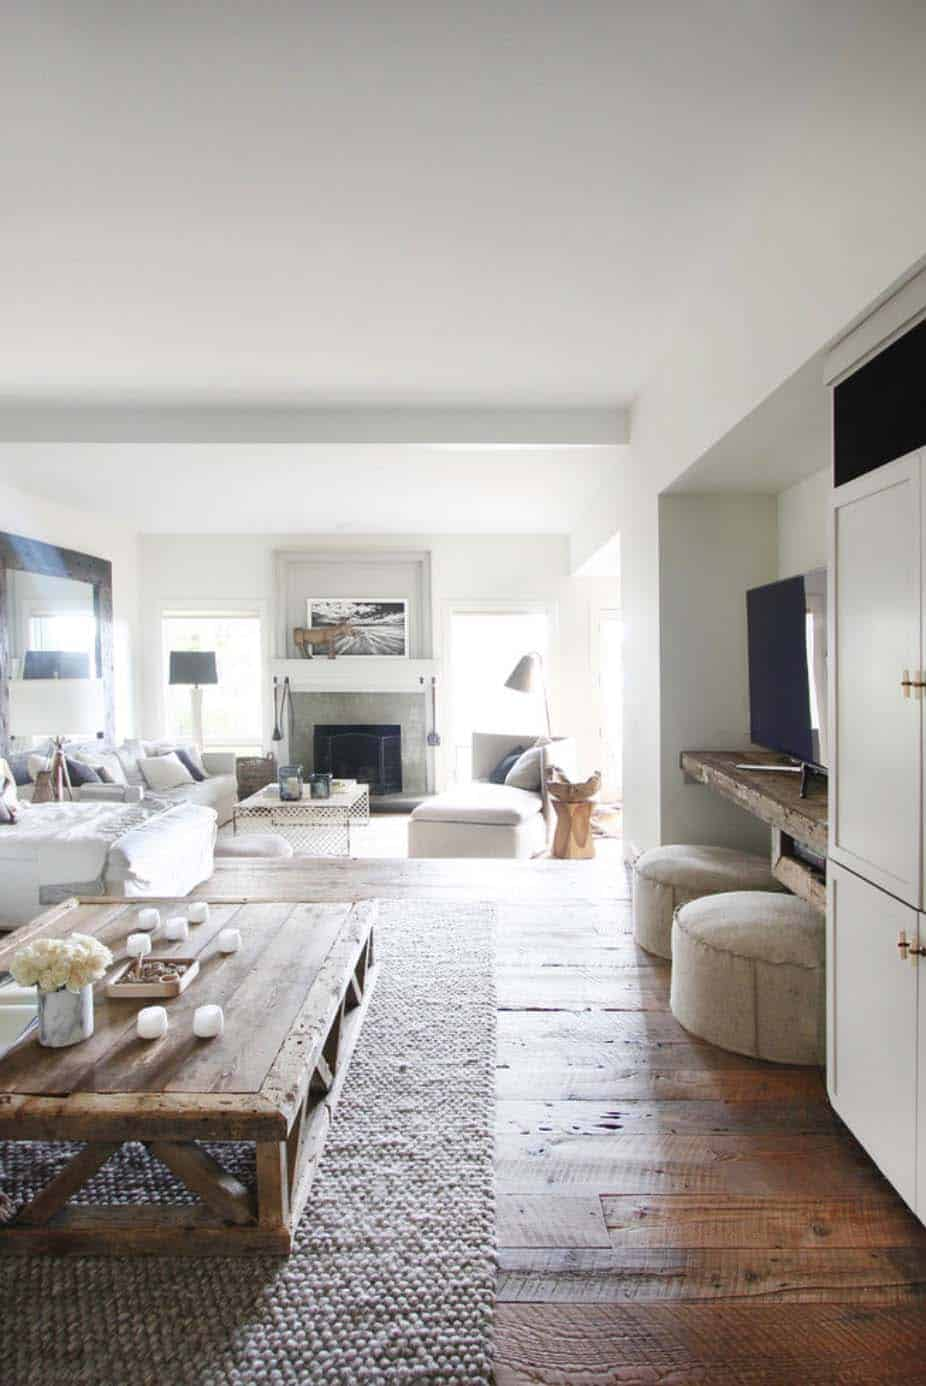 Modern beach house with an organic feel in North Carolina